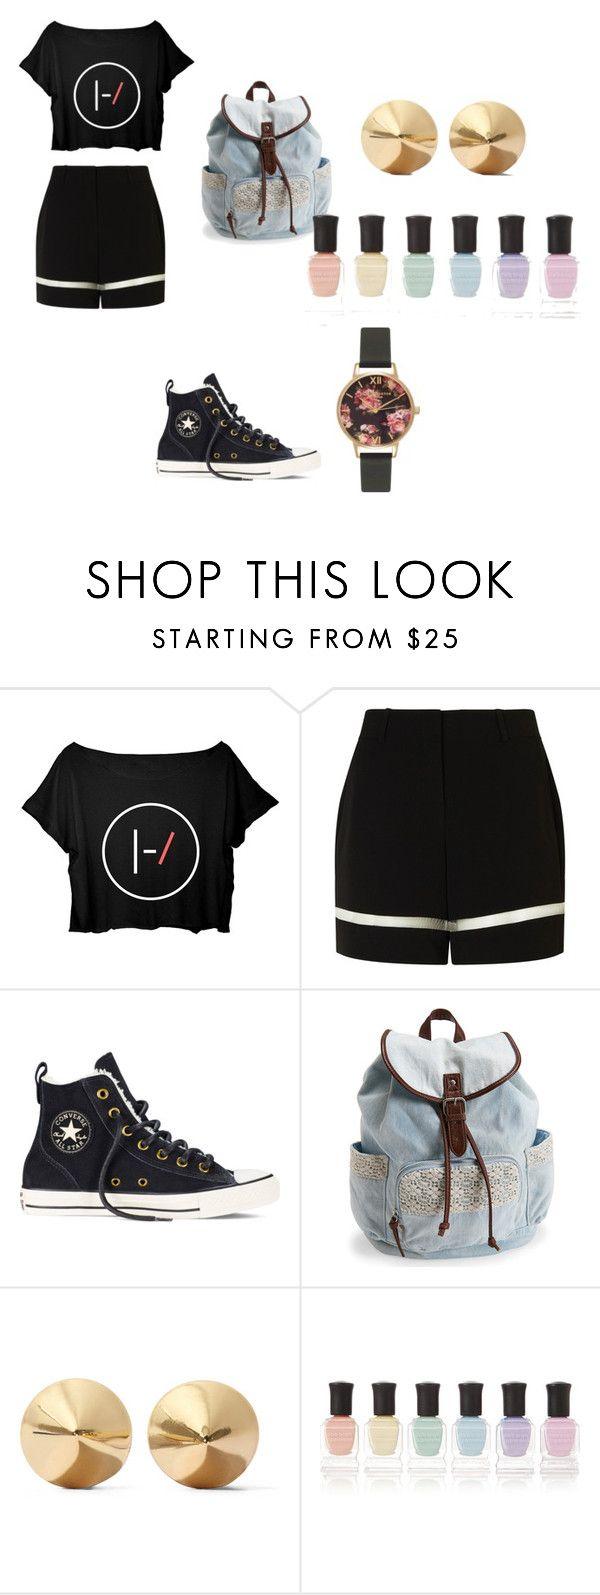 """#57"" by sadradinova-polina on Polyvore featuring мода, Alexander Wang, Converse, Aéropostale, Eddie Borgo, Deborah Lippmann, Olivia Burton, women's clothing, women и female"